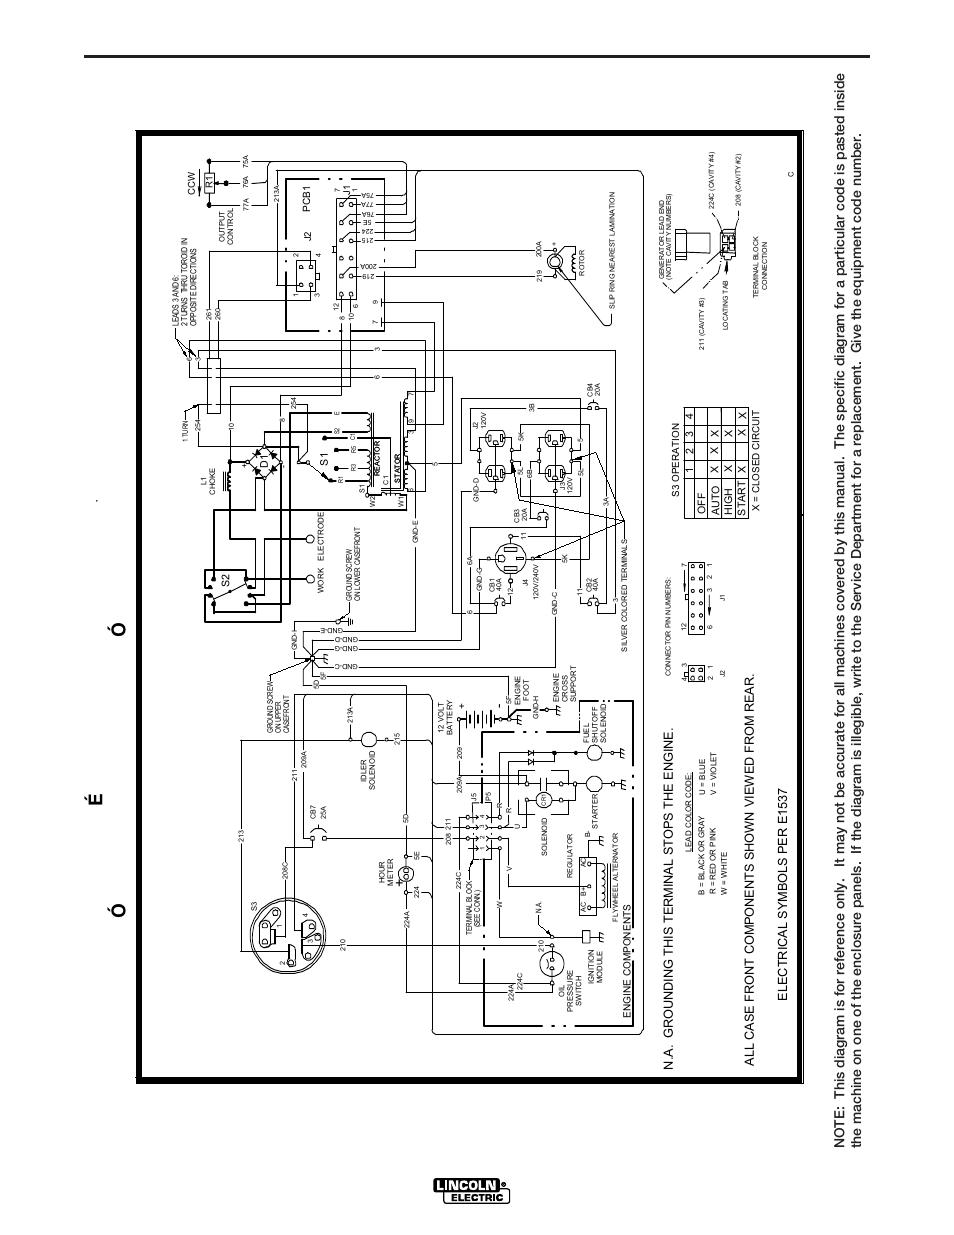 lincoln ranger 10000 parts diagram